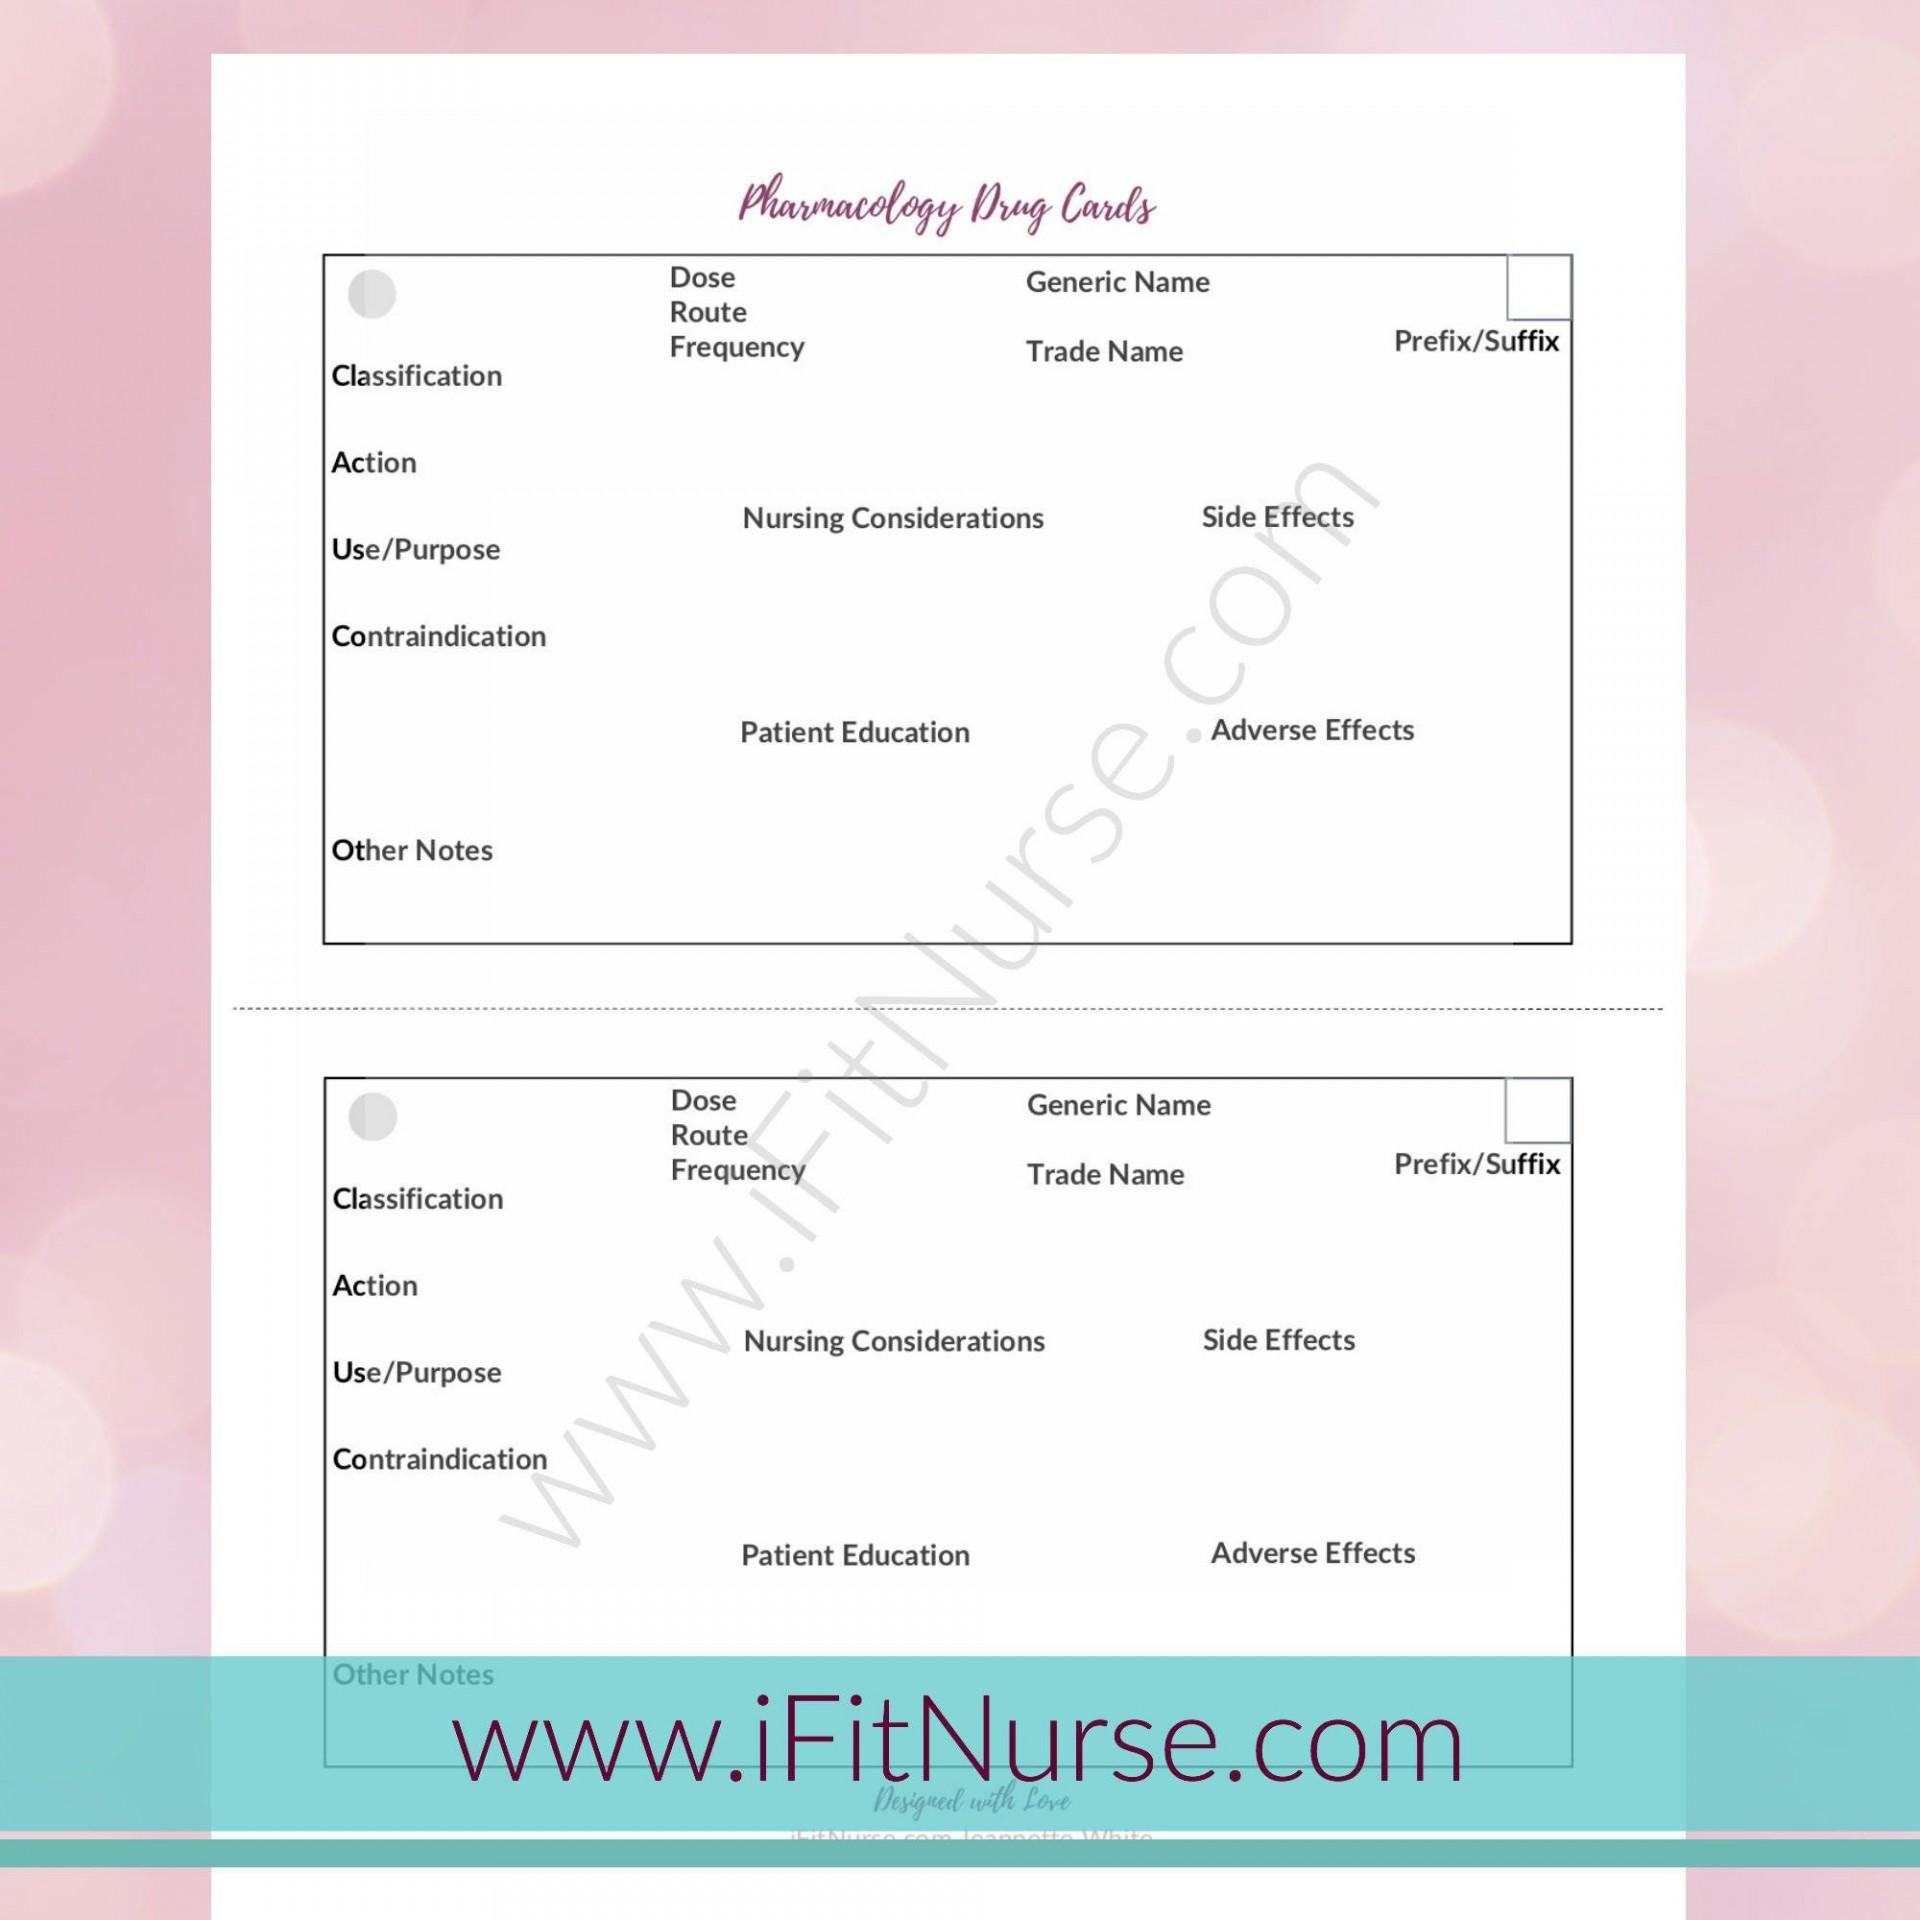 007 Staggering Nursing Drug Card Template Concept  School Download Printable1920